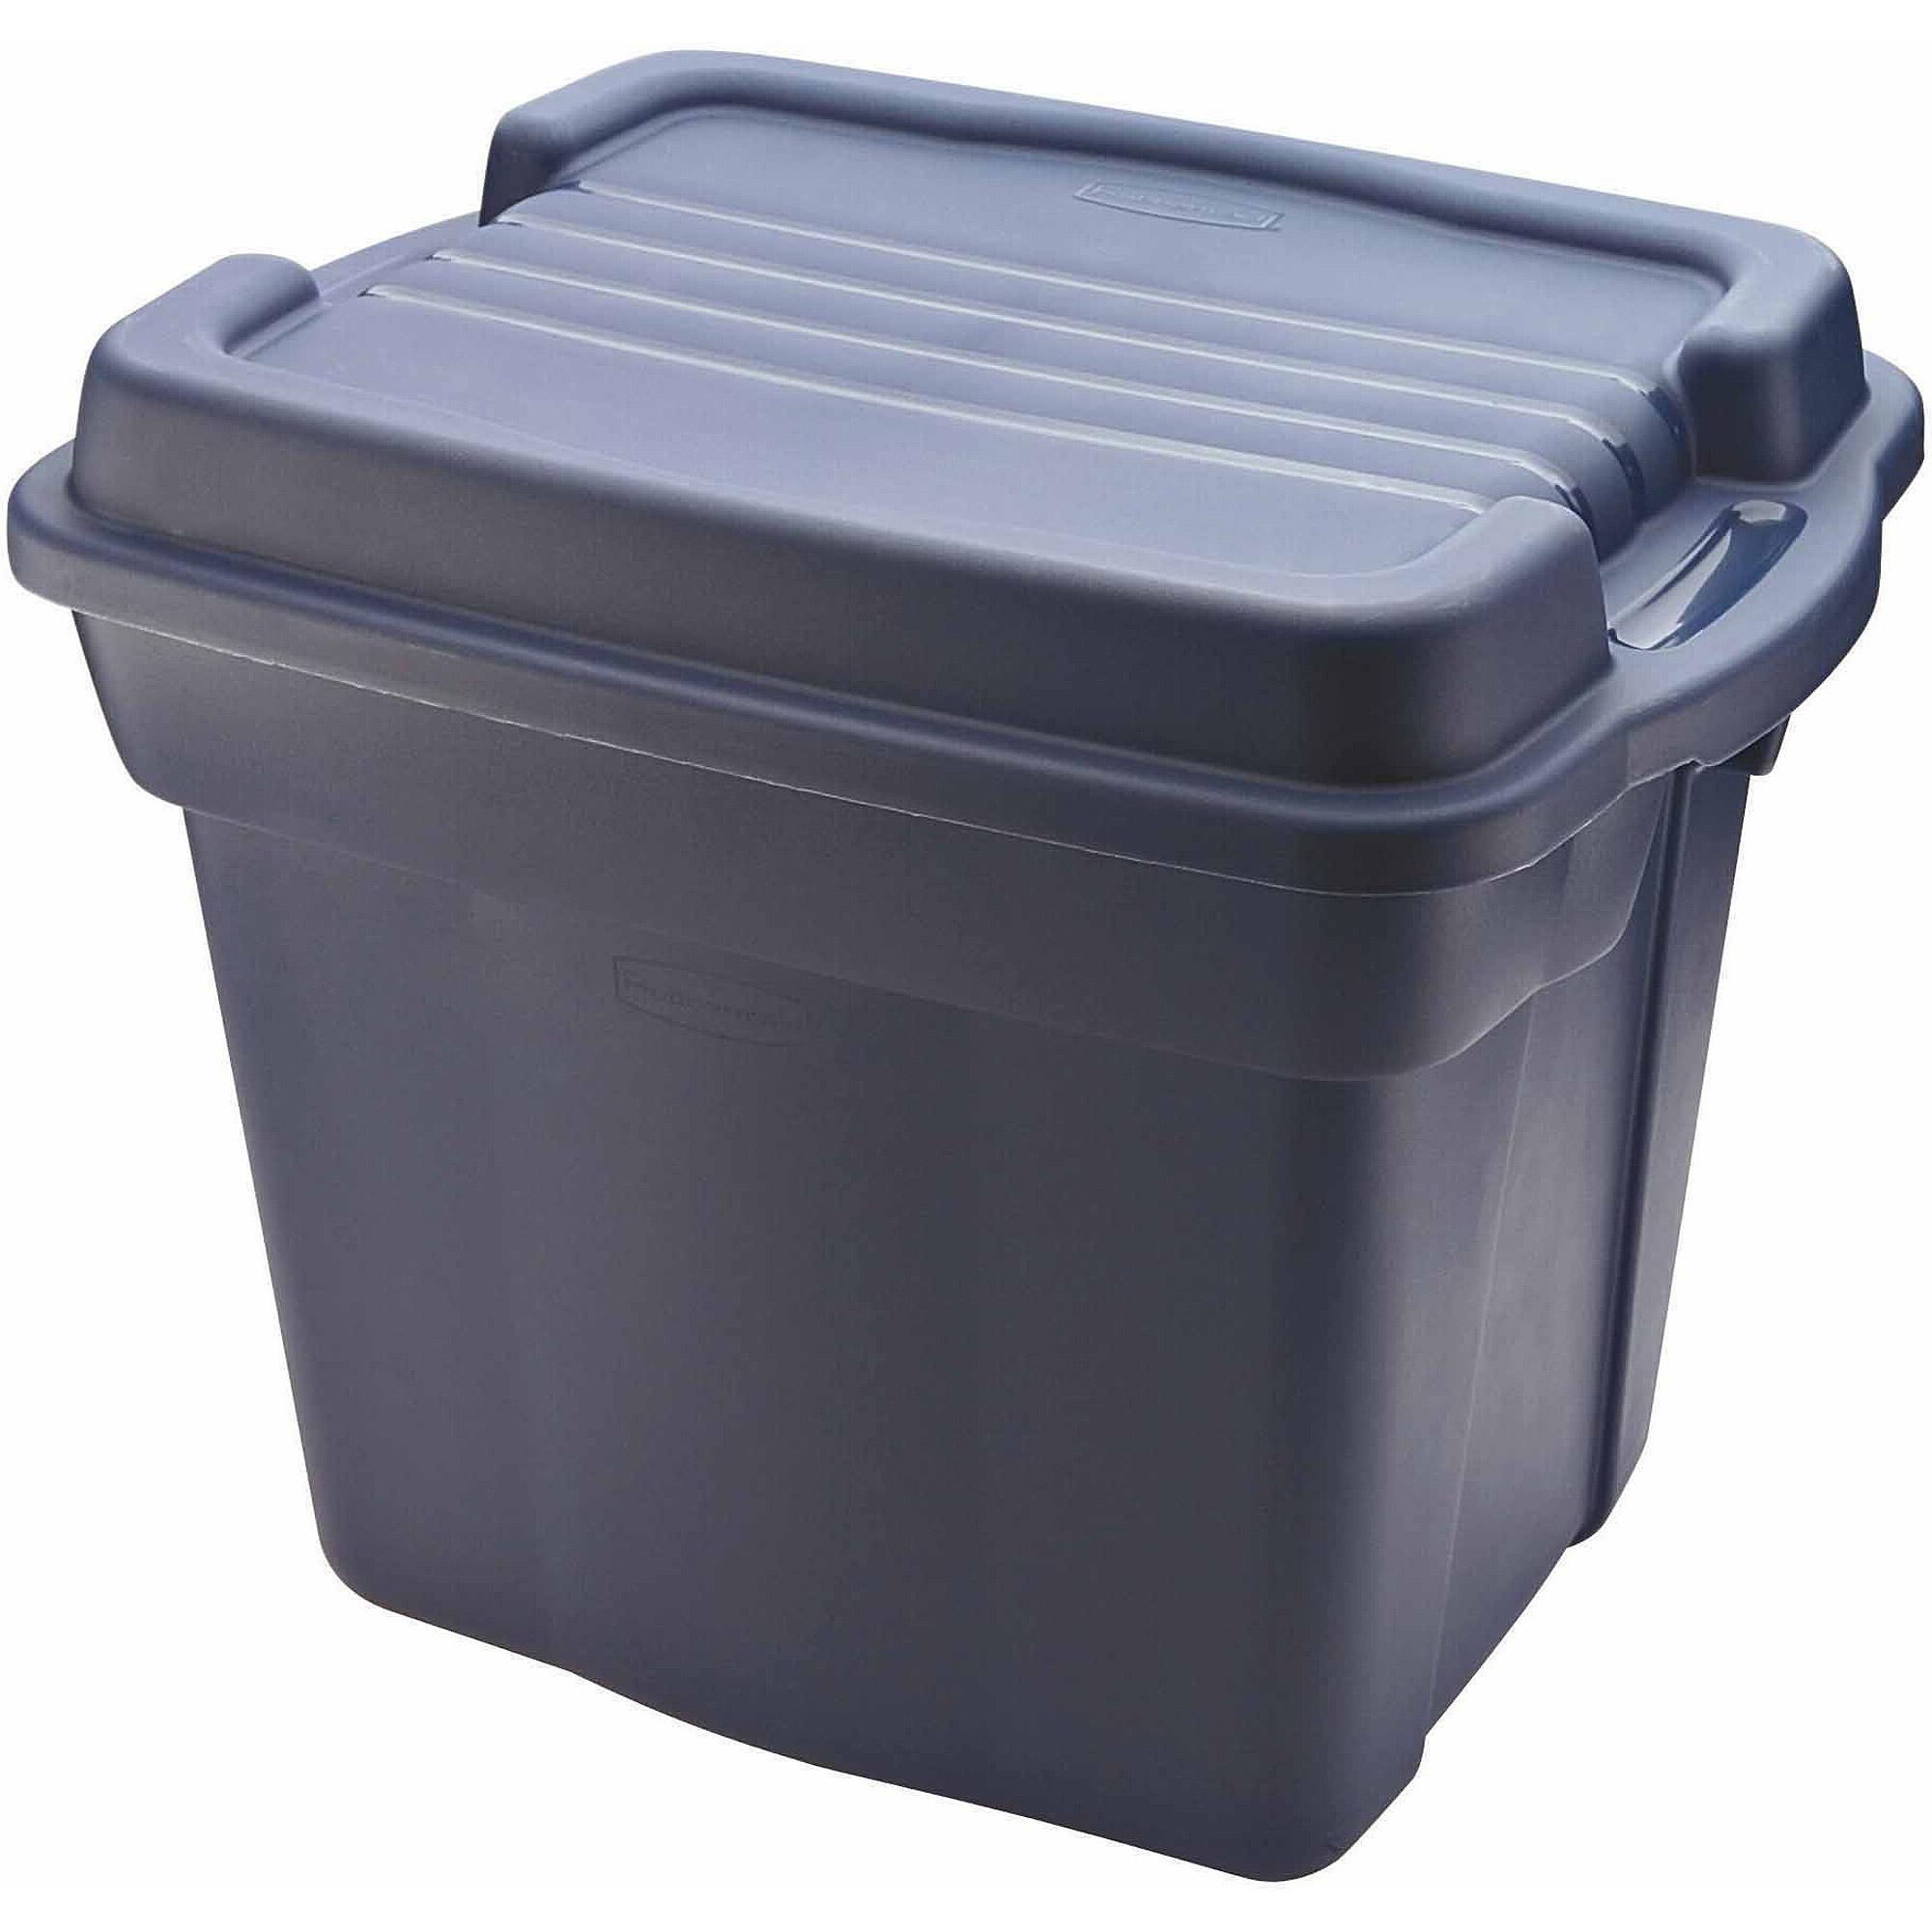 Rubbermaid Roughneck 24-Gallon Tote, Dark Indigo Metallic